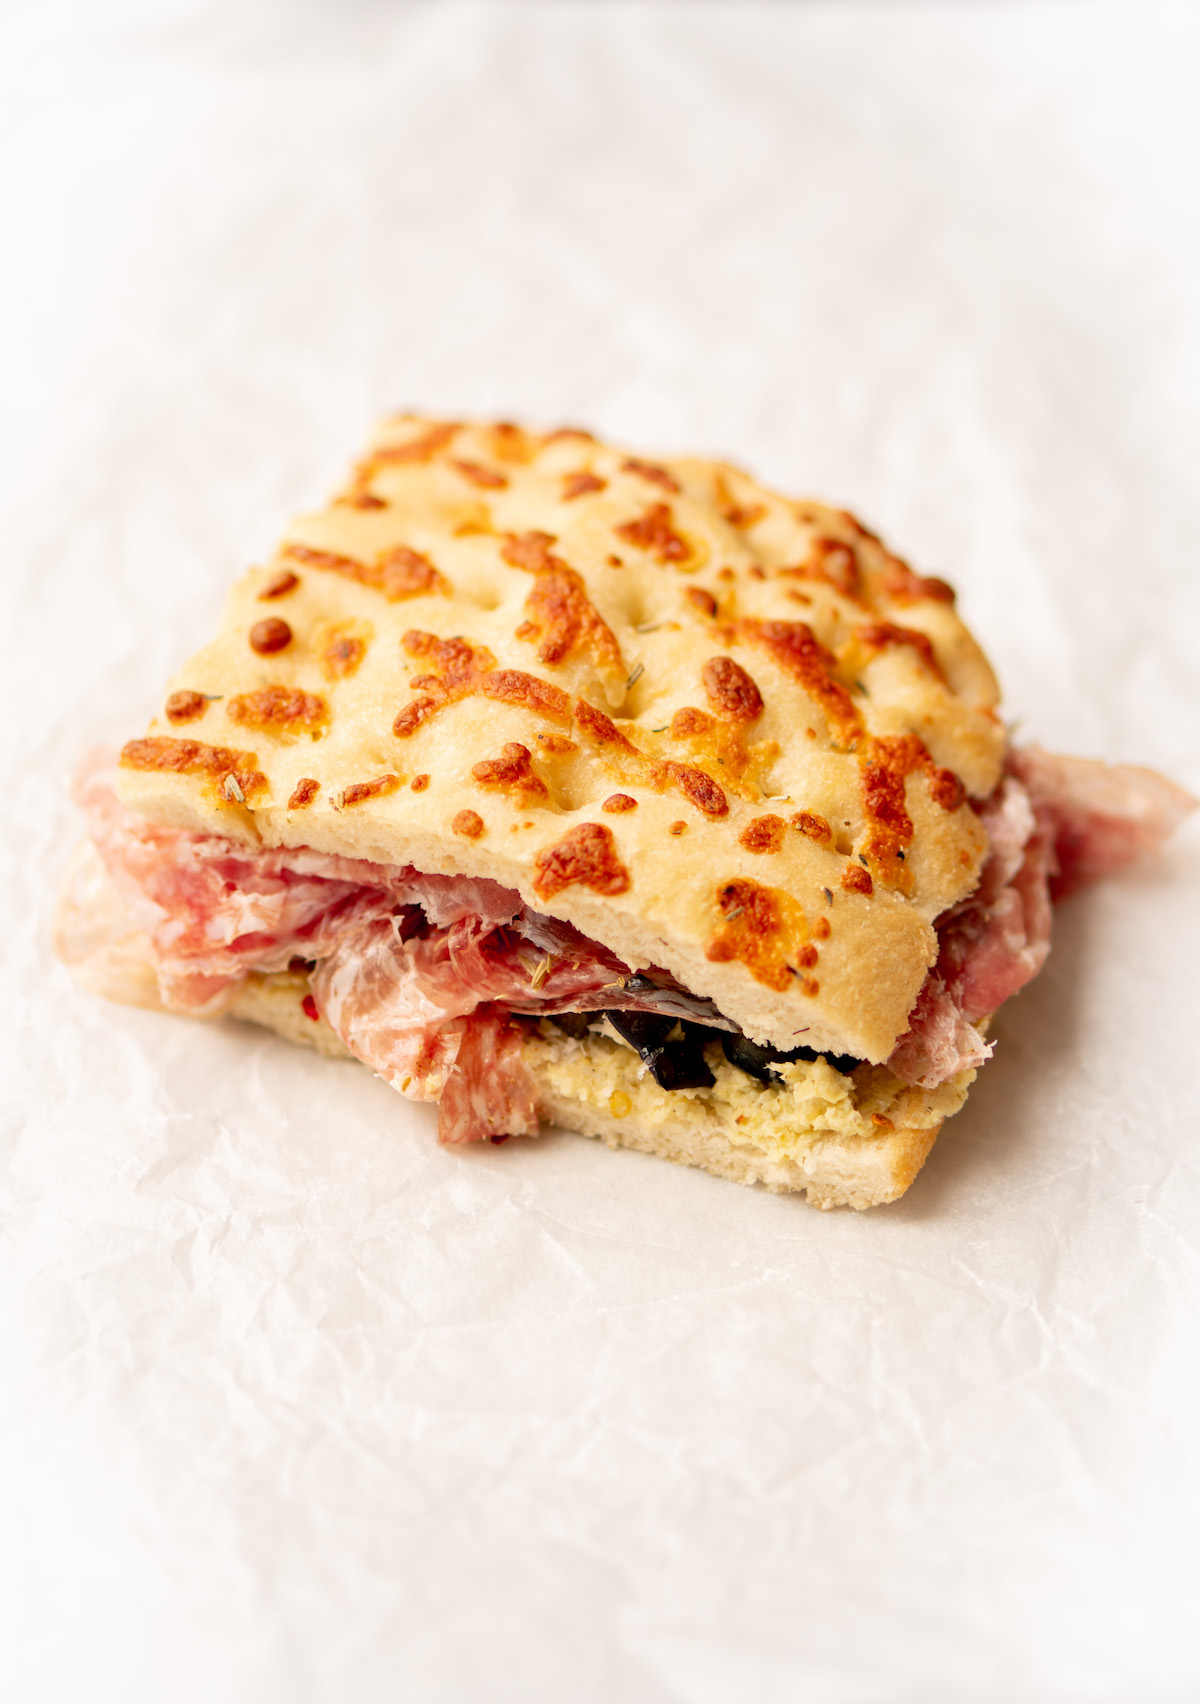 Focaccia met salami en artisjokkencrème